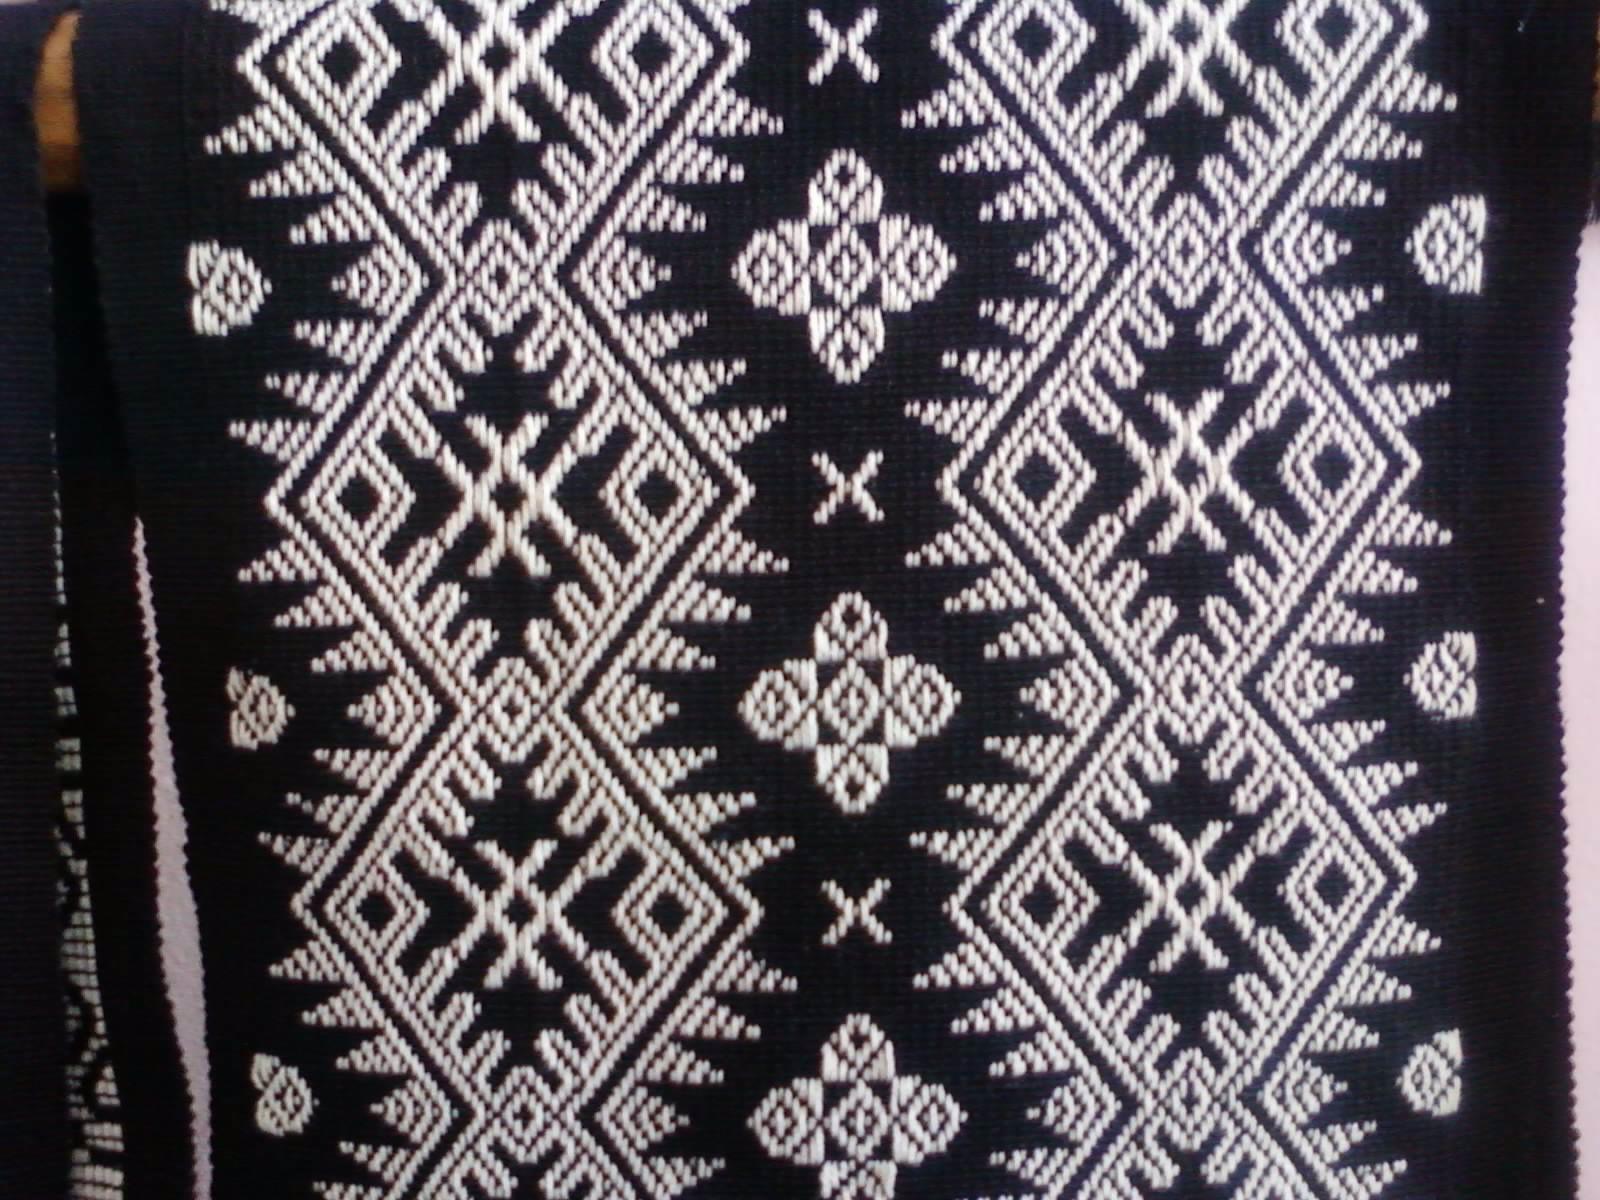 Ragam hias seluruh indonesia | Sharing knowledge